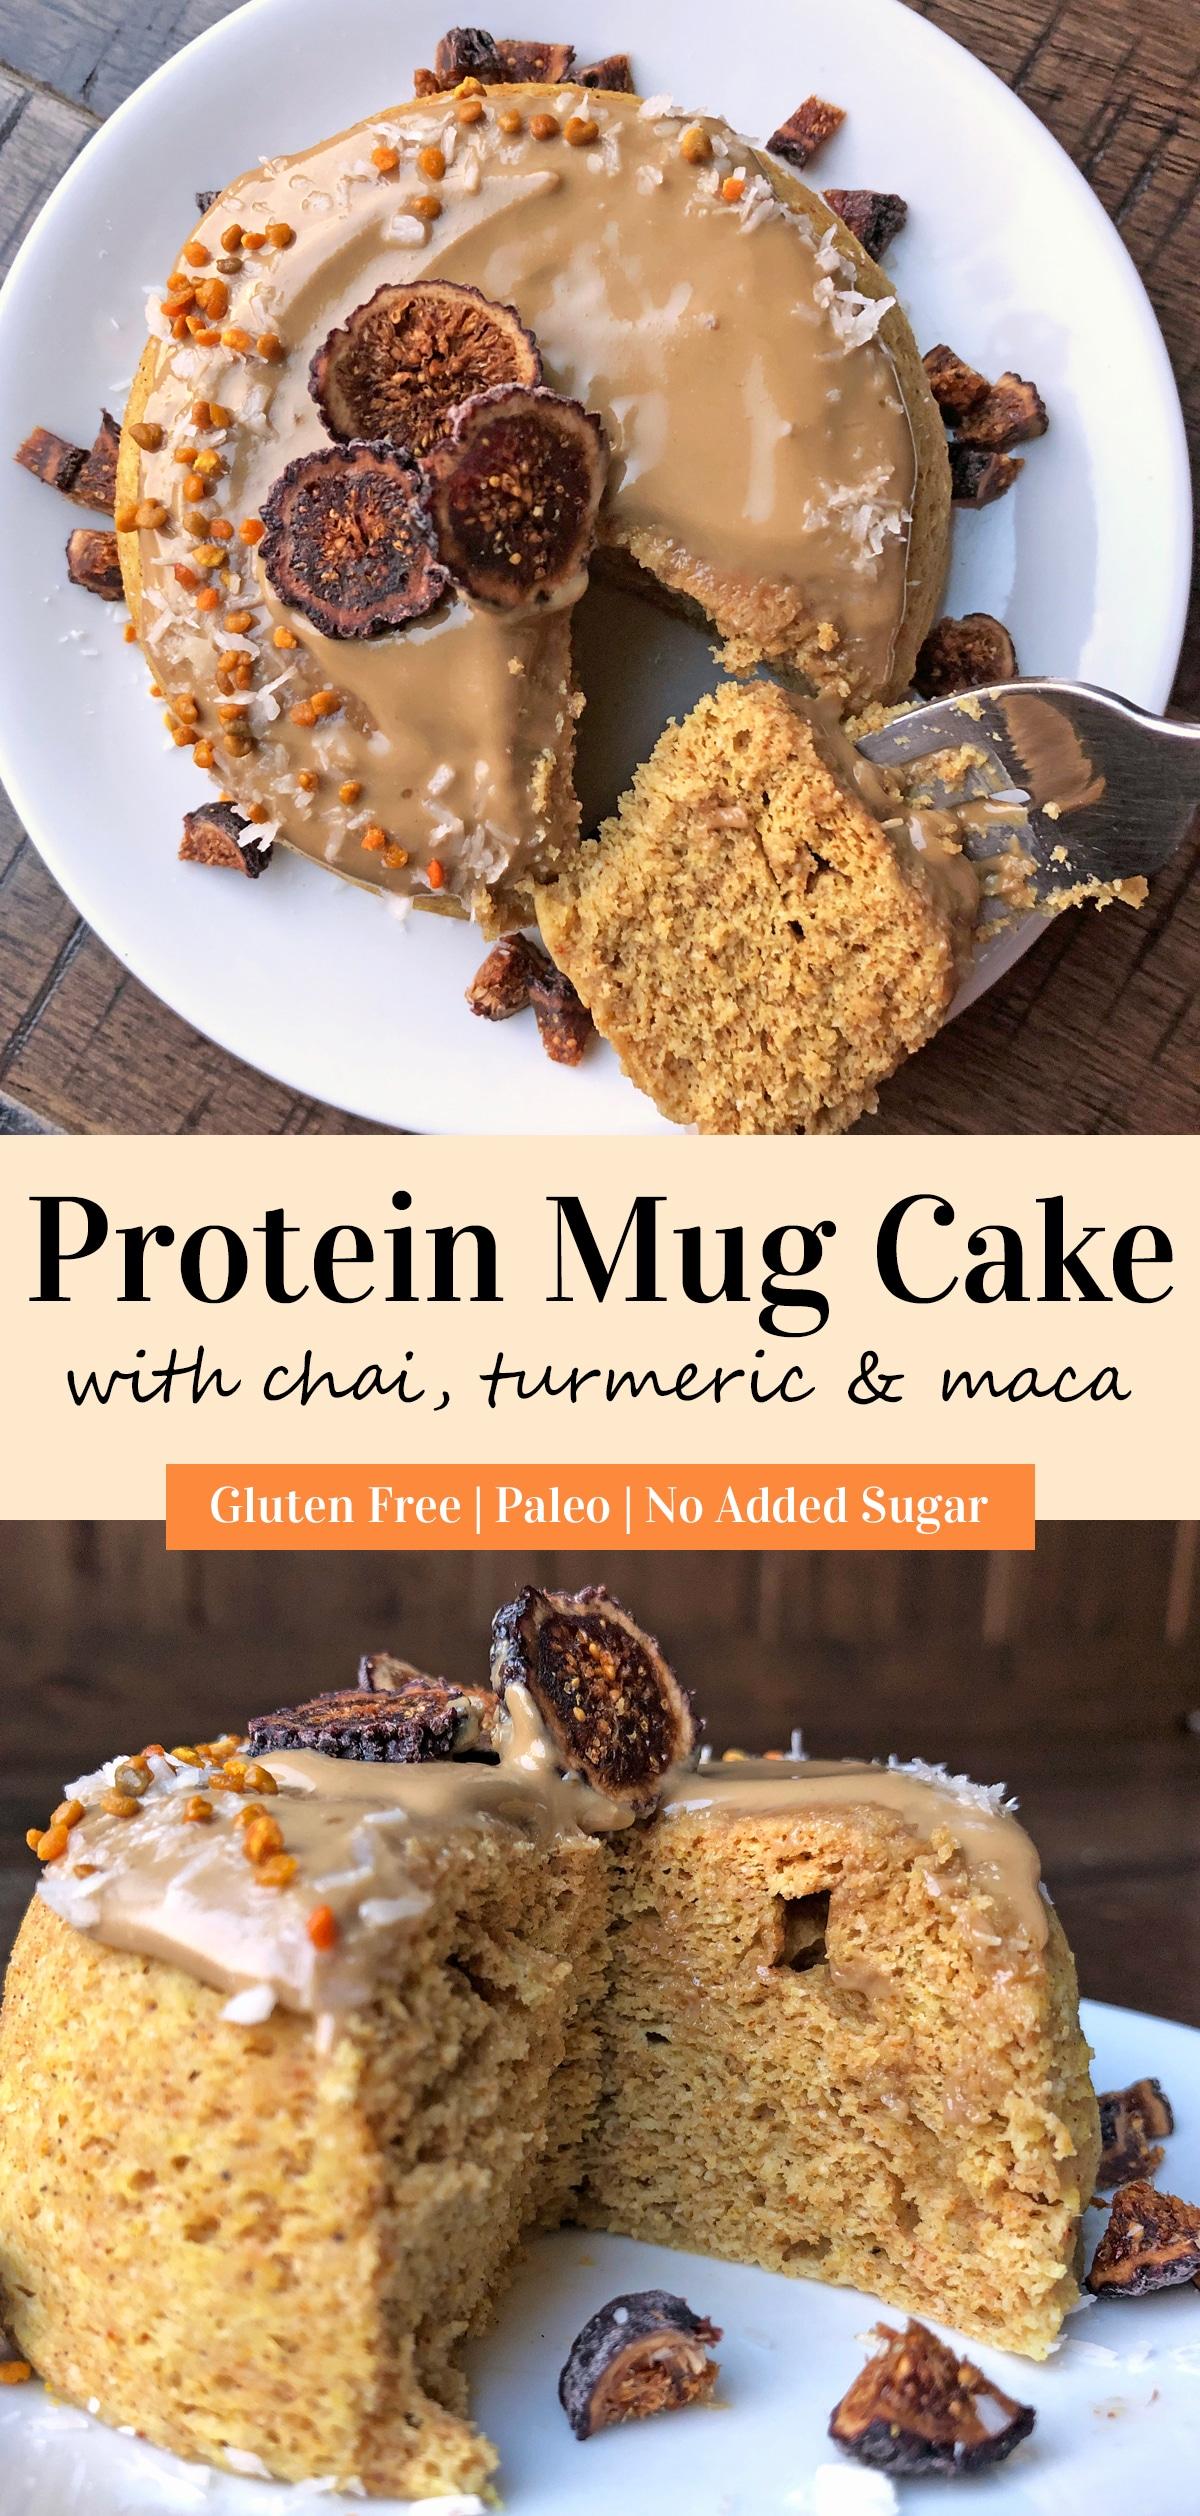 protein-mug-cake-with-chai-turmeric-and-maca-pinterest-image